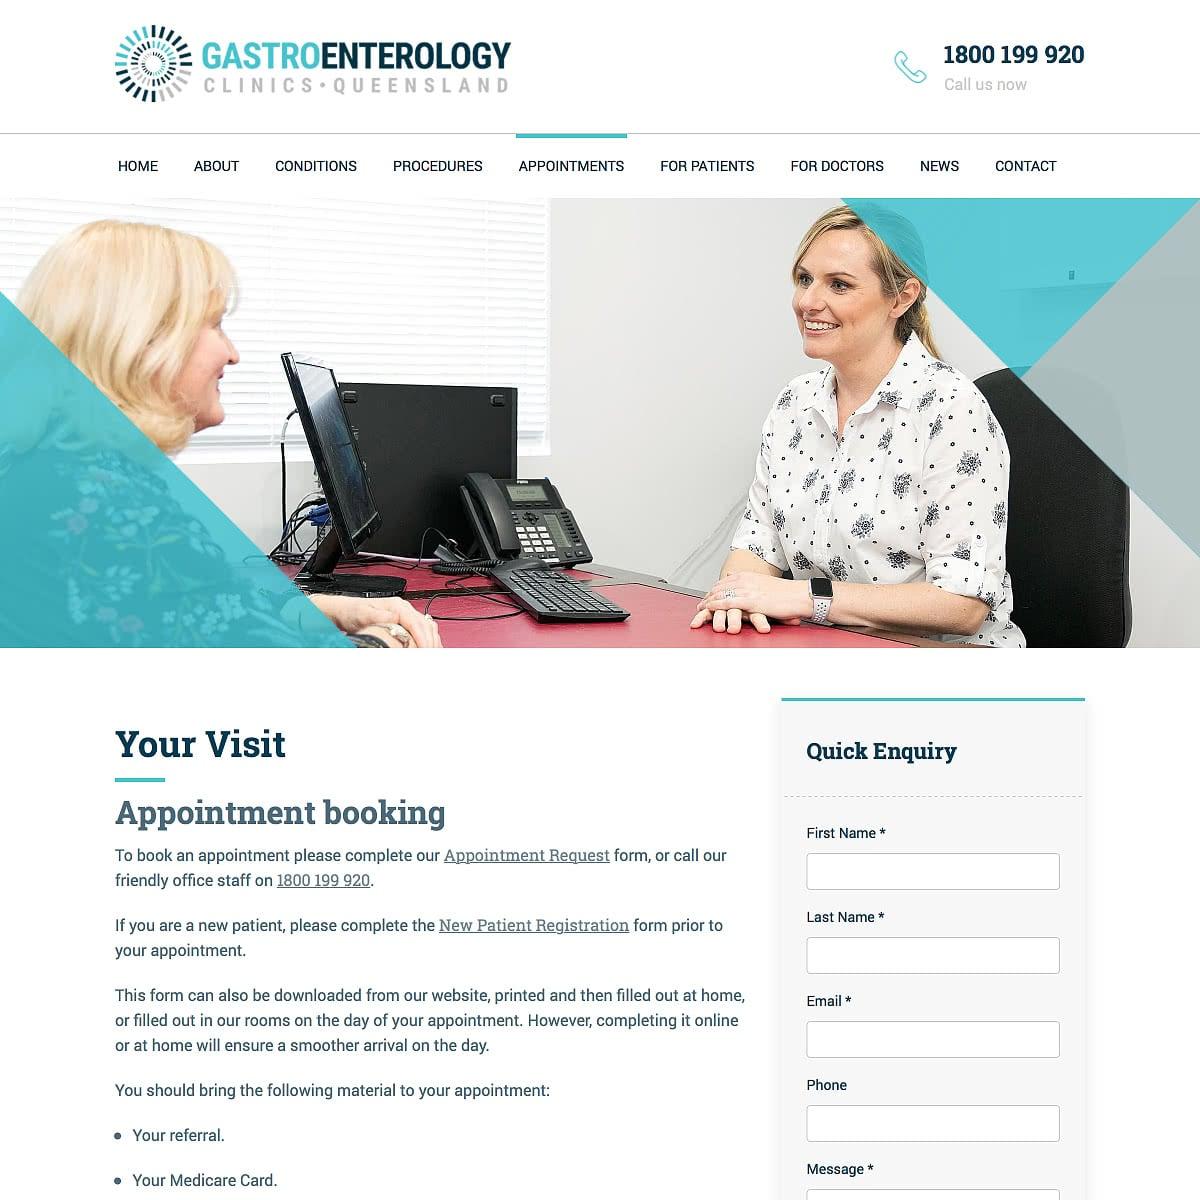 Gastroenterology Clinics Queensland - Your Visit